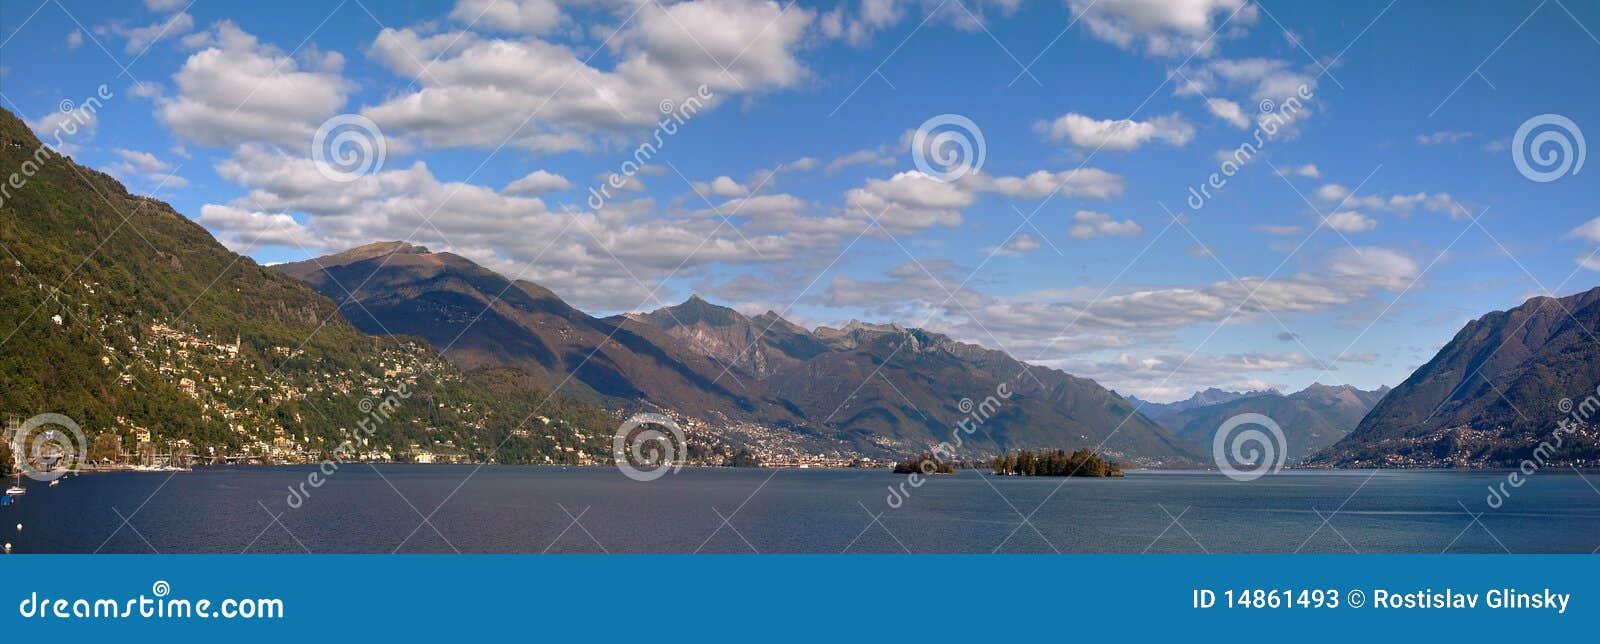 Panoramic view on Lake Maggiore.